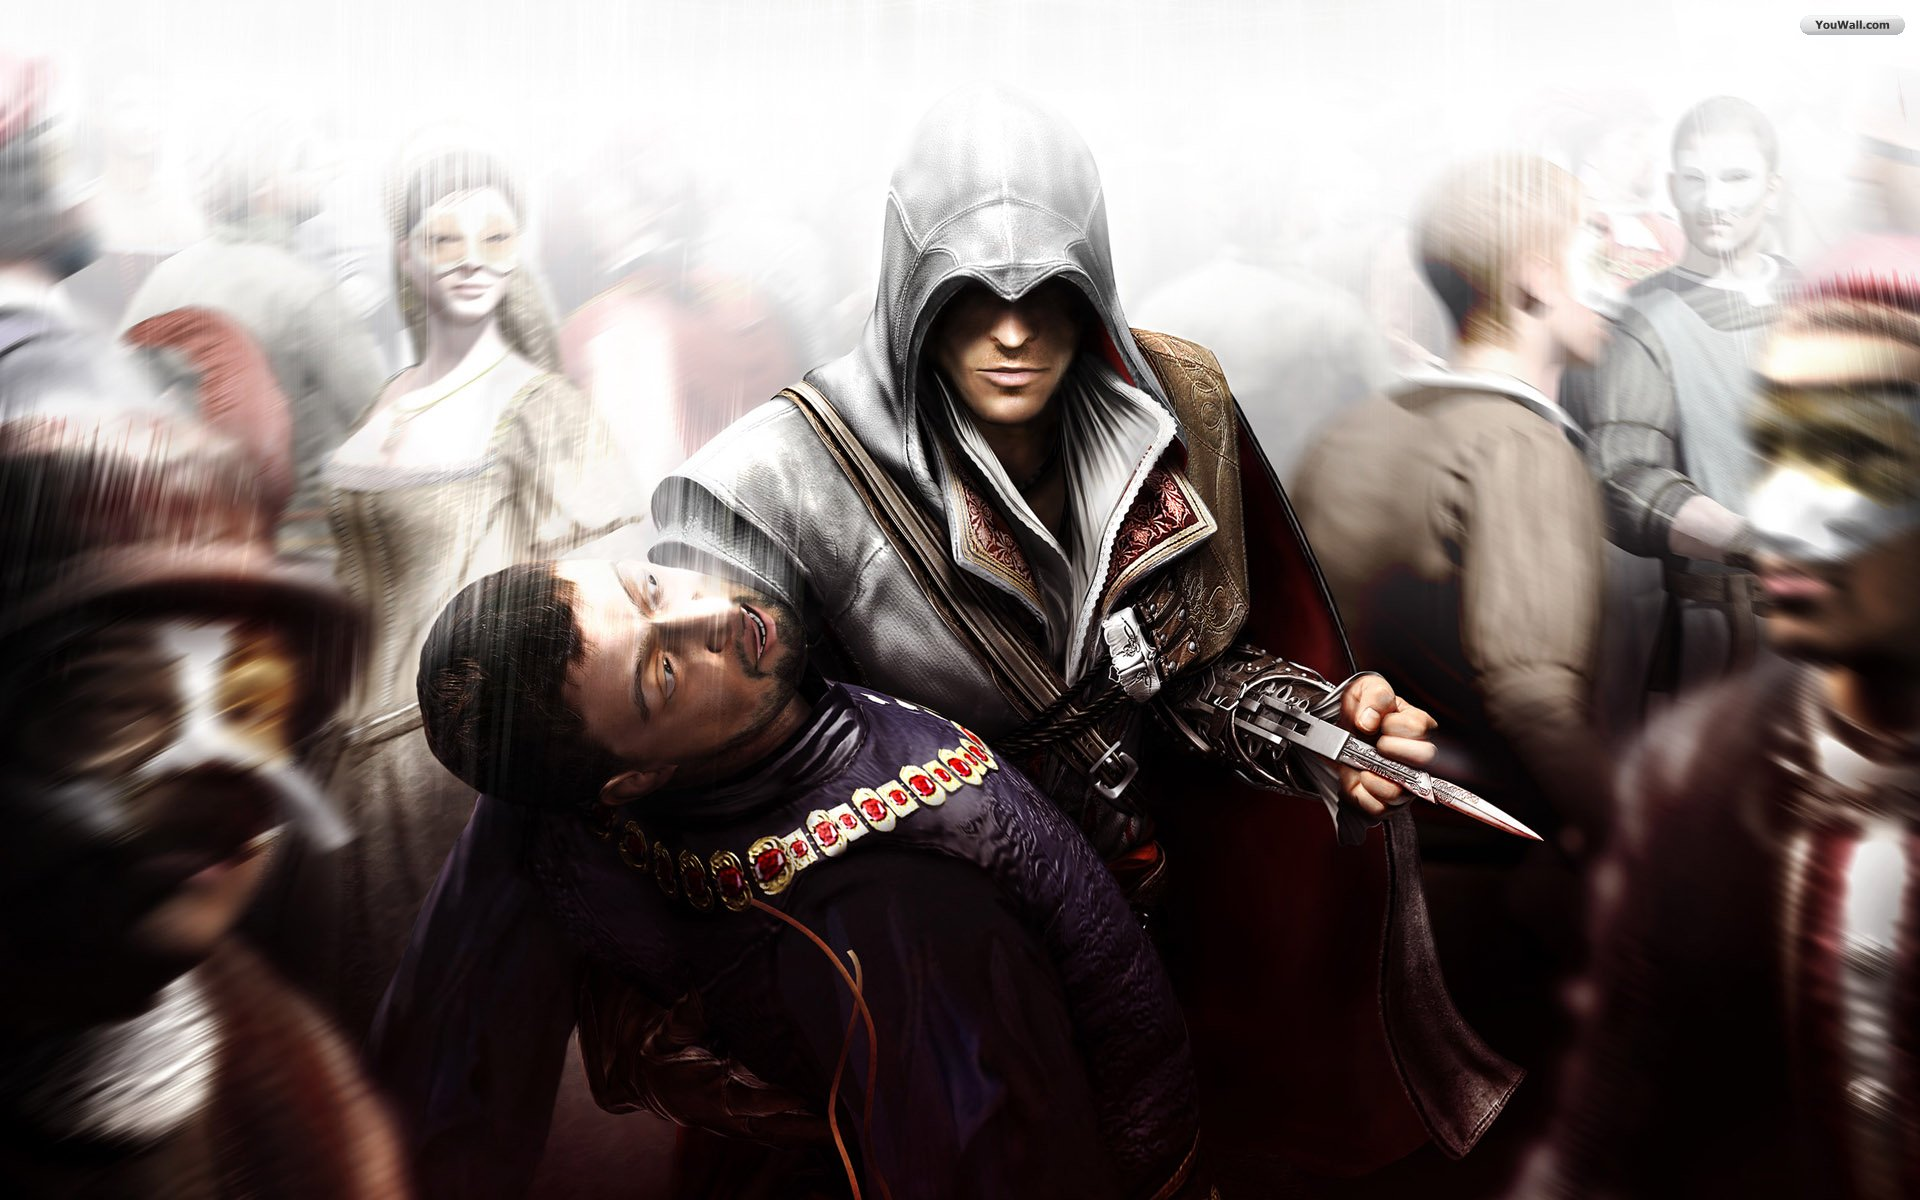 HD Assassins Creed Venice Wallpaper